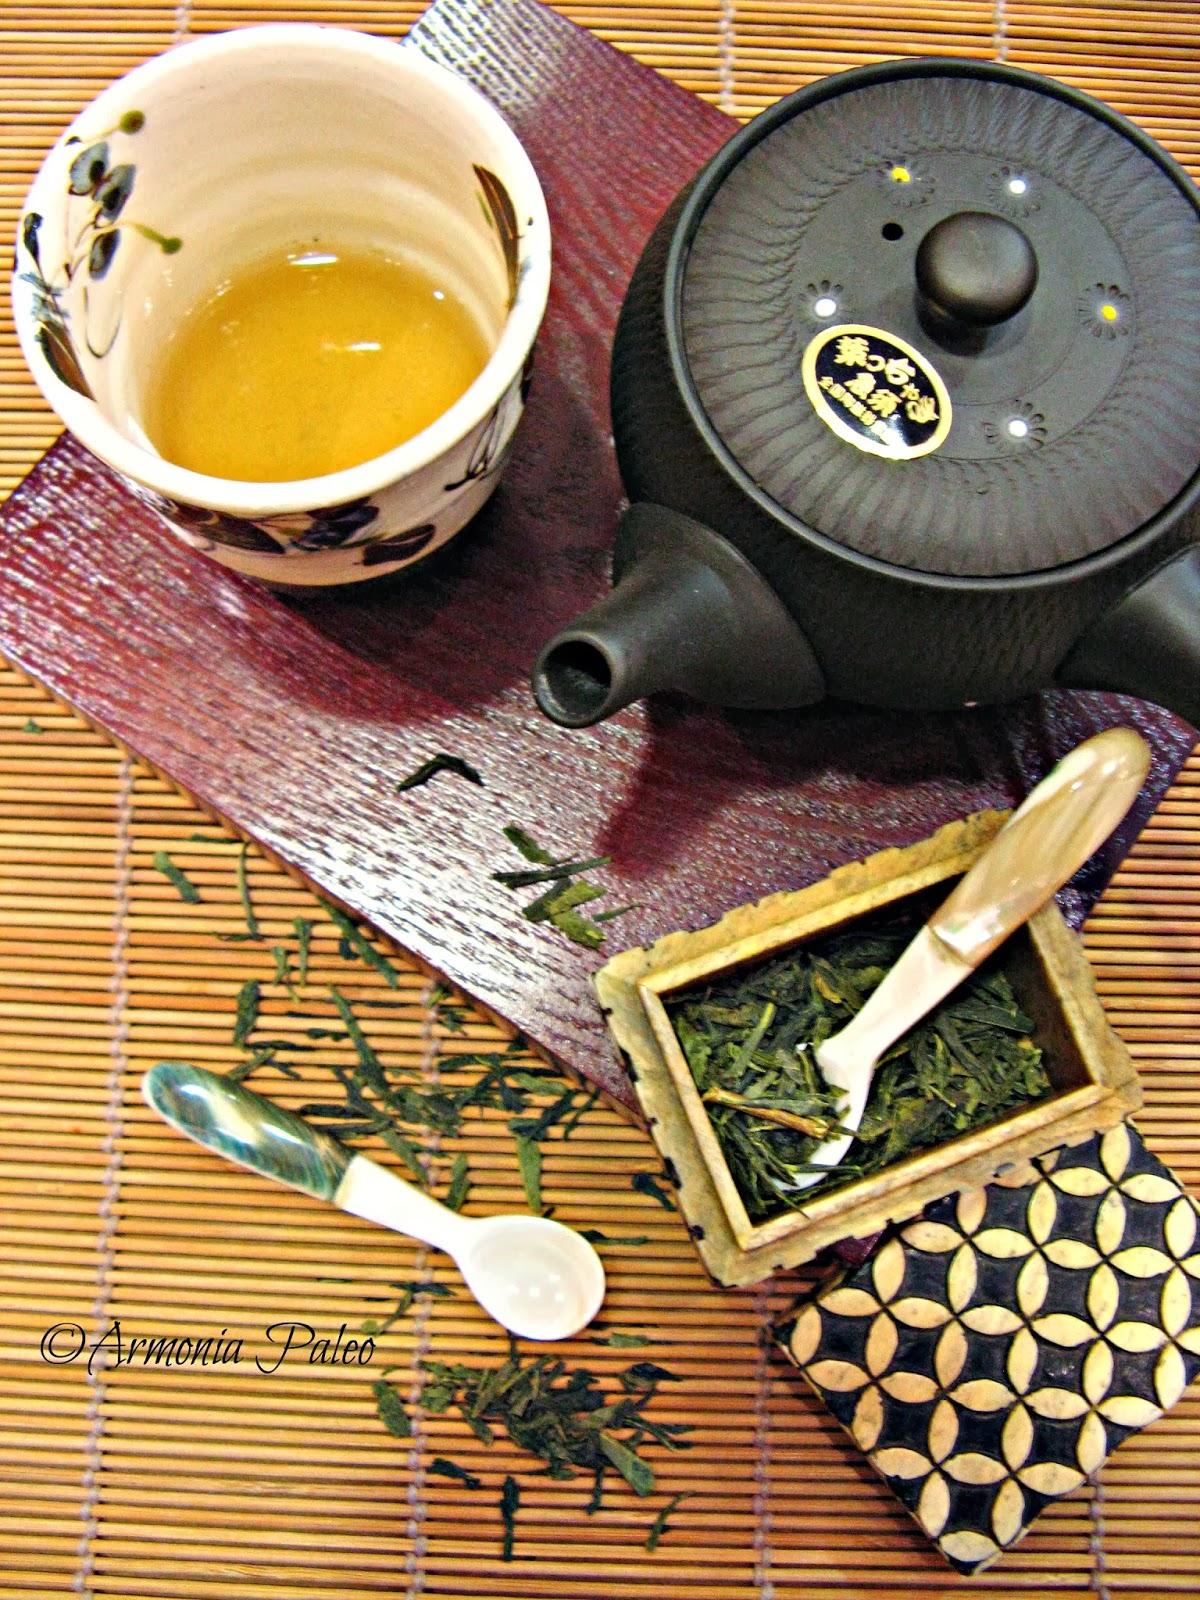 Tè Verde Bancha di Armonia Paleo